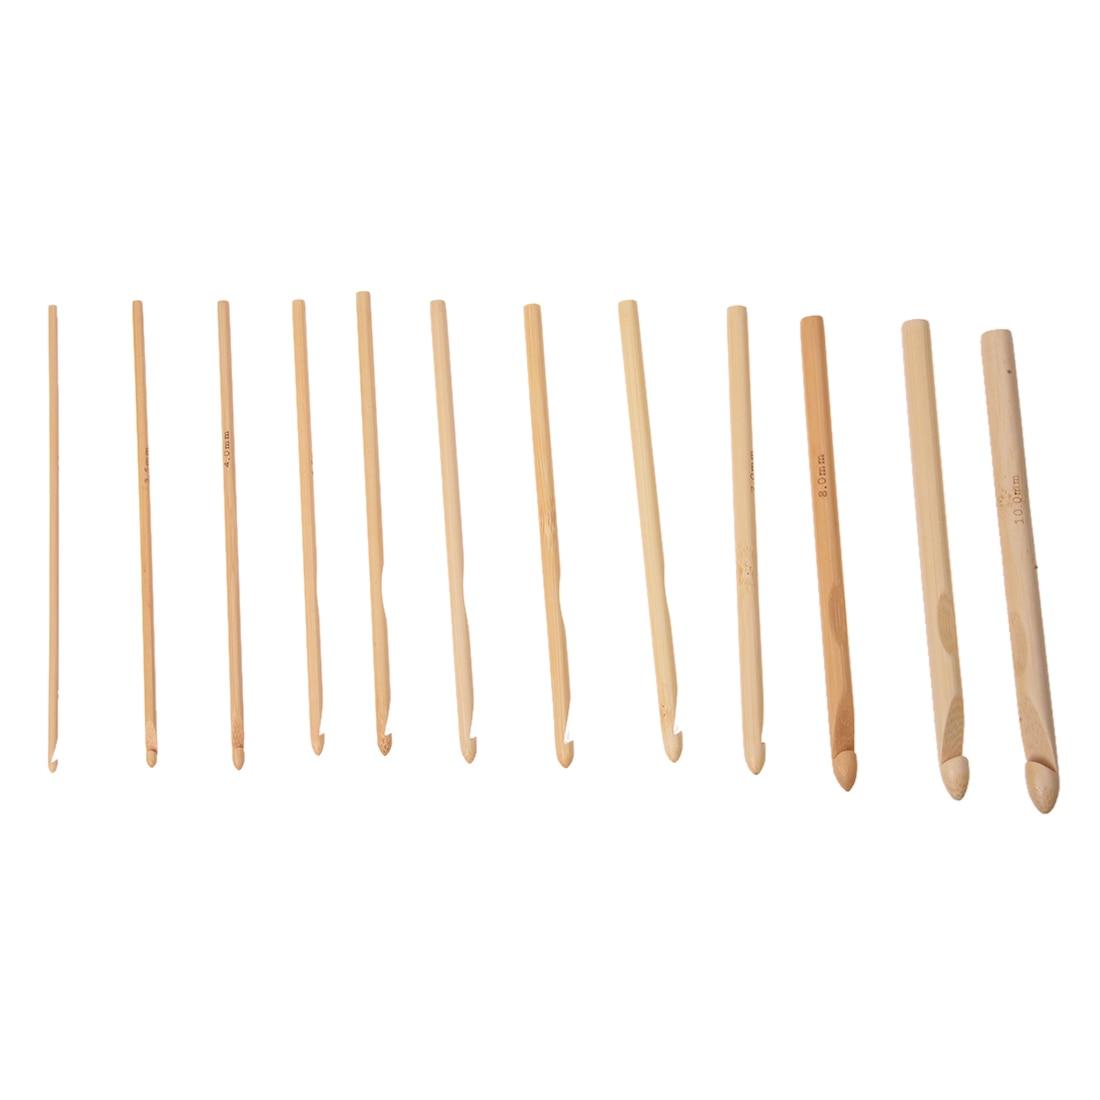 18 Sizes 2.0mm-10.0mm 80 cm Circular Needles and 12 Sizes 3,0-10mm Bamboo Crochet Hook Knitting Needles 1